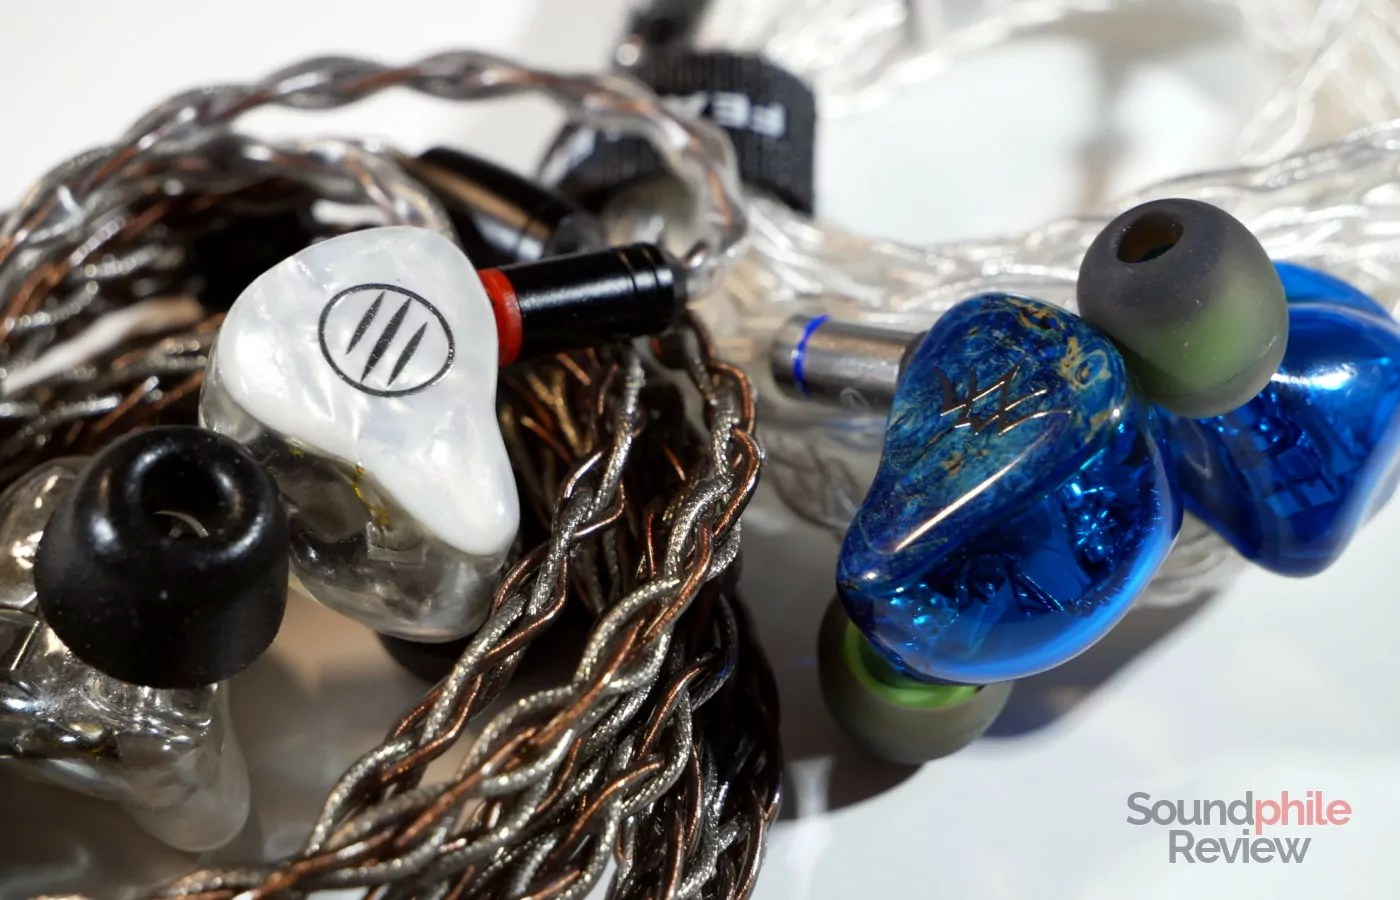 BGVP DM7 Fearless Audio S8 Pro Headphones in Pictures